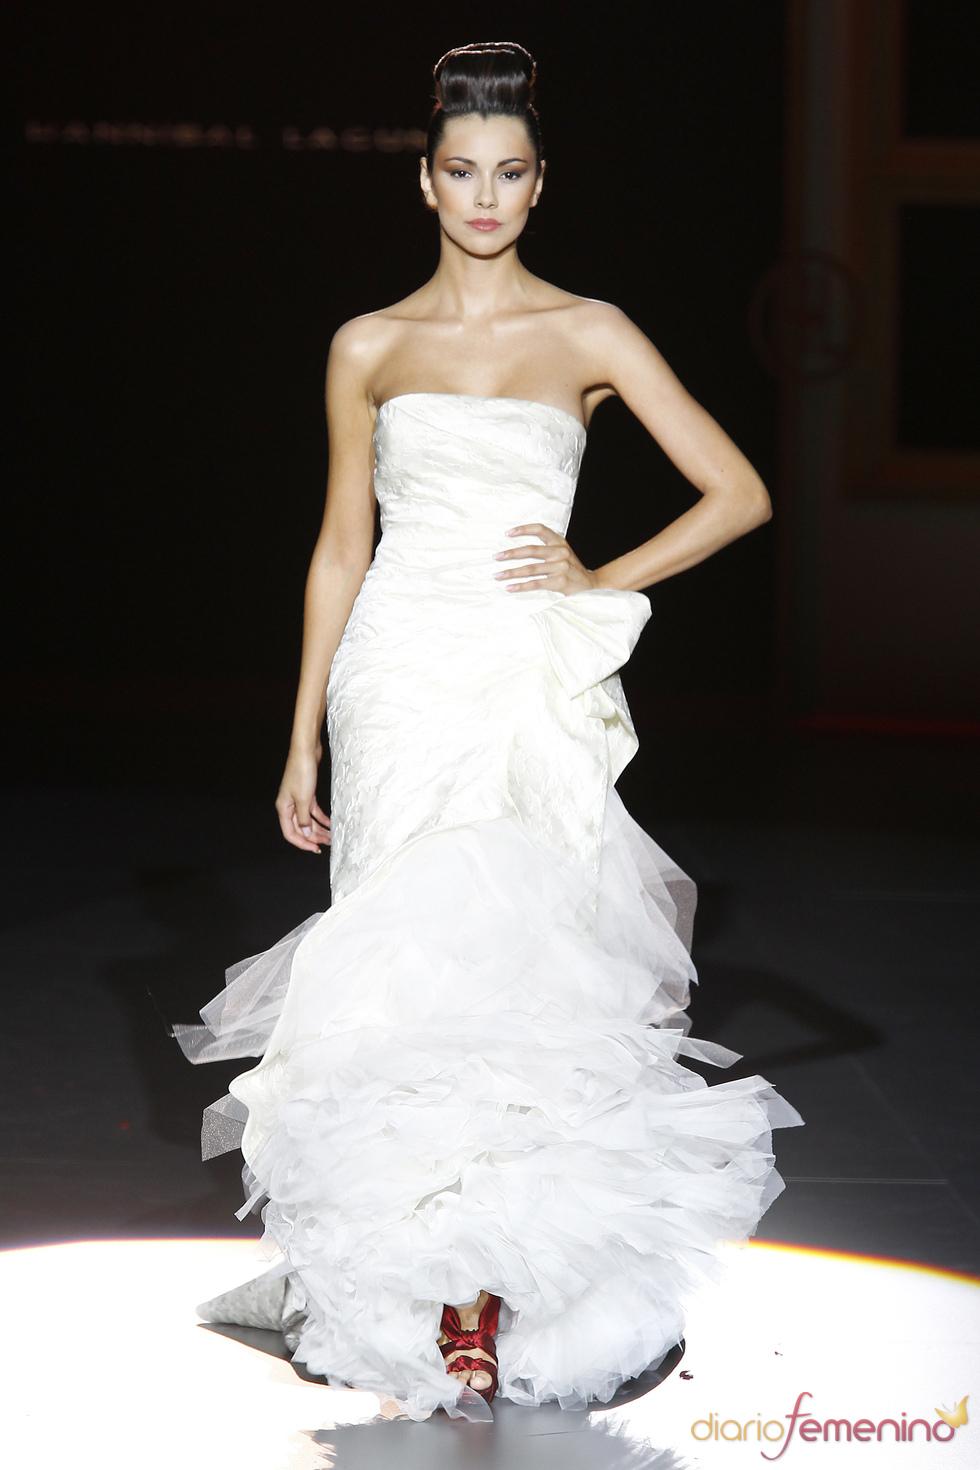 Vestido de novia de Hannibal Laguna